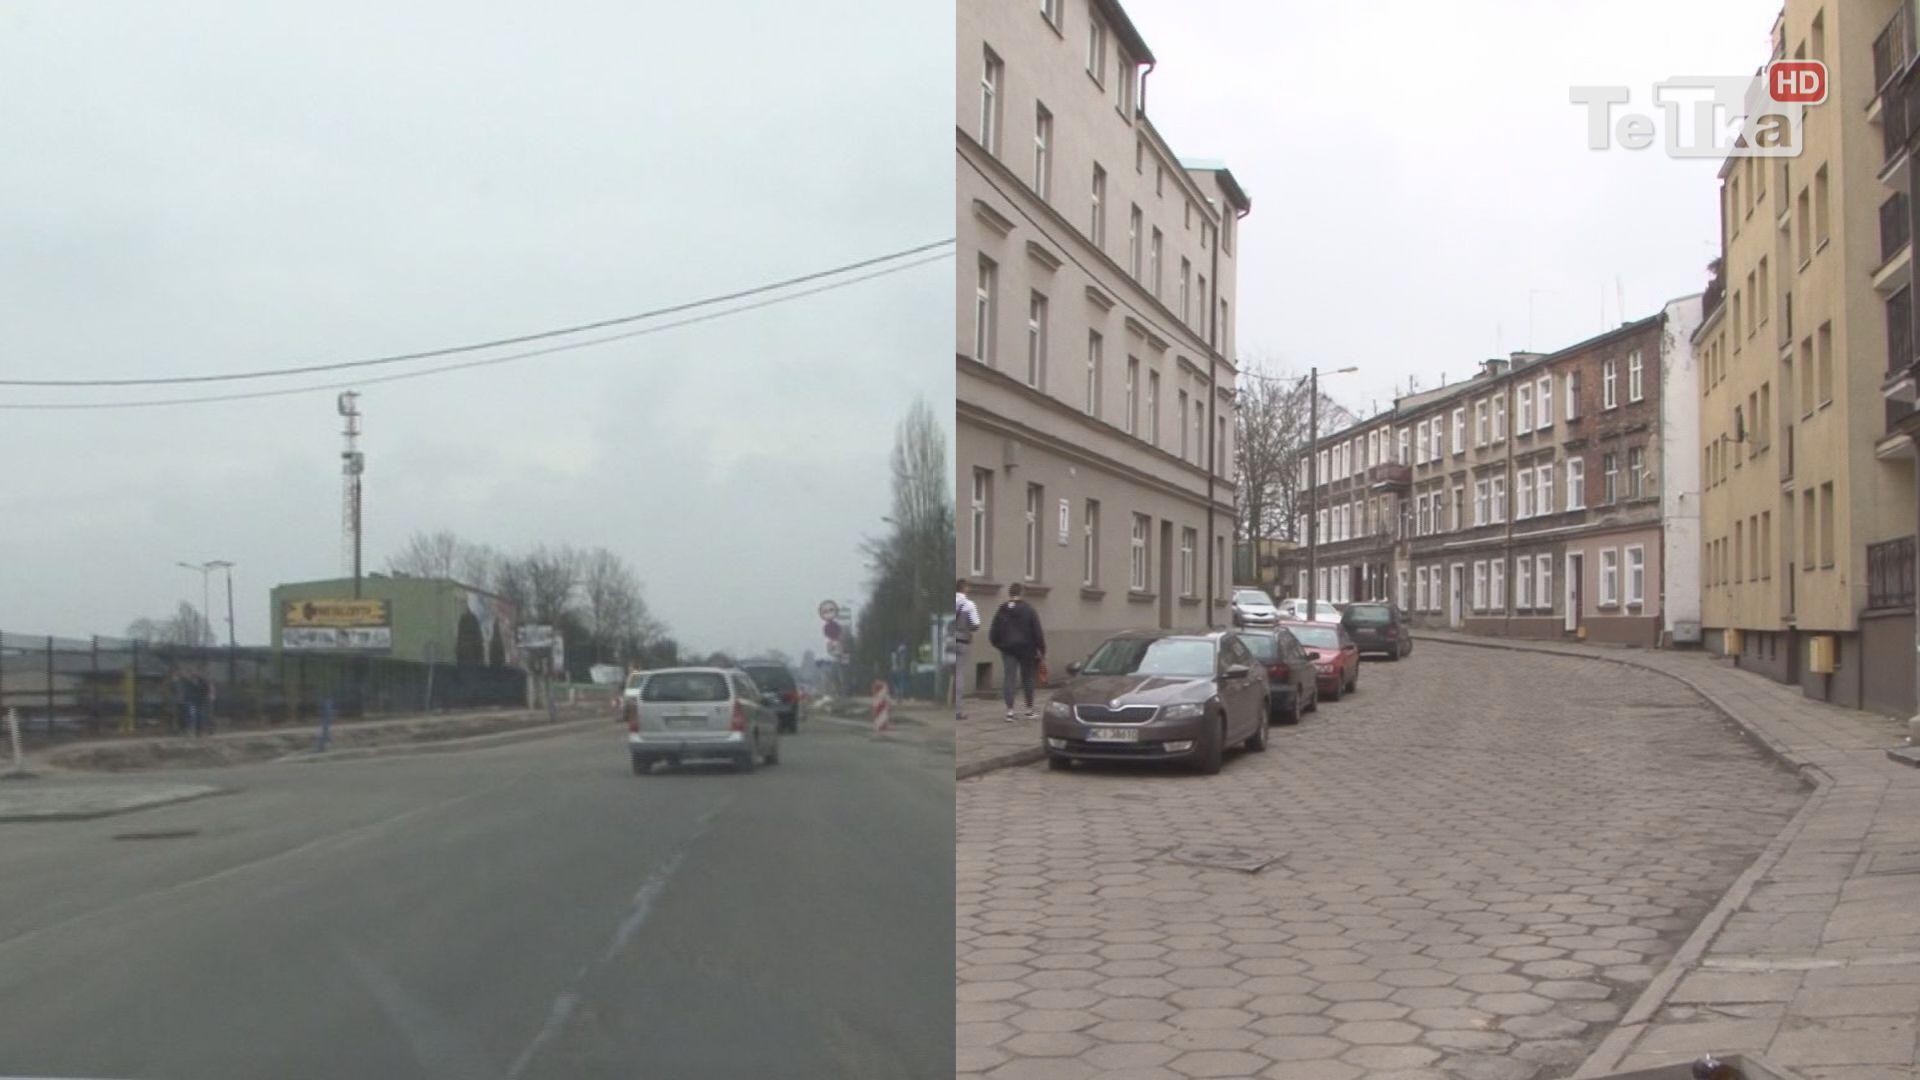 ulica krolowej jadwigi